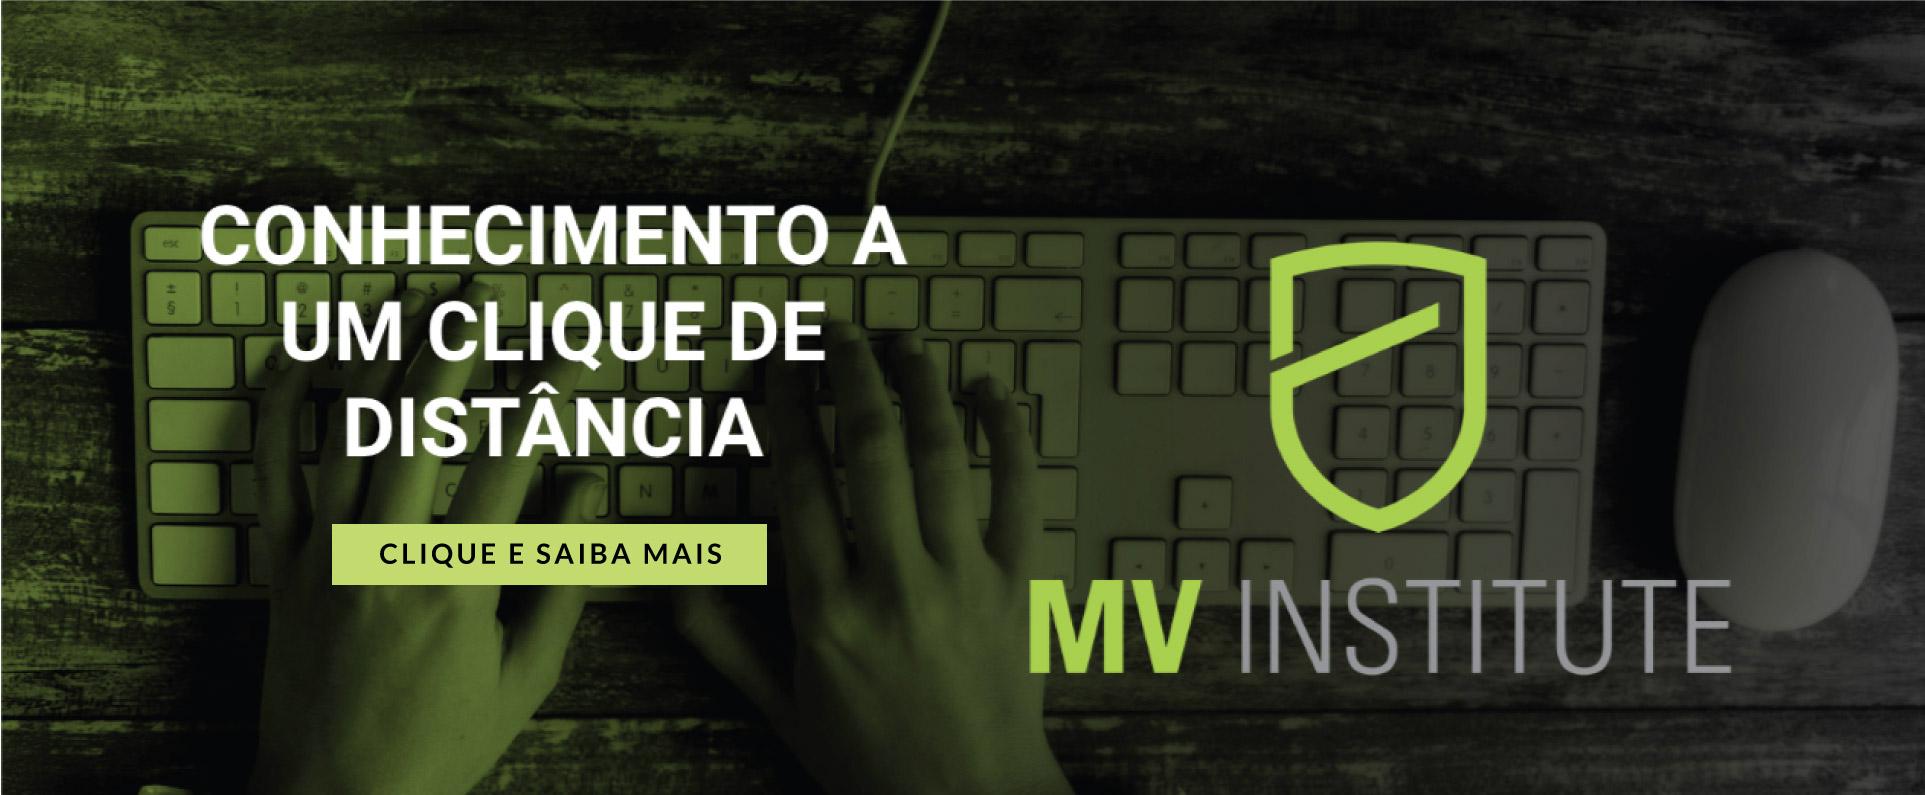 Mv Institute